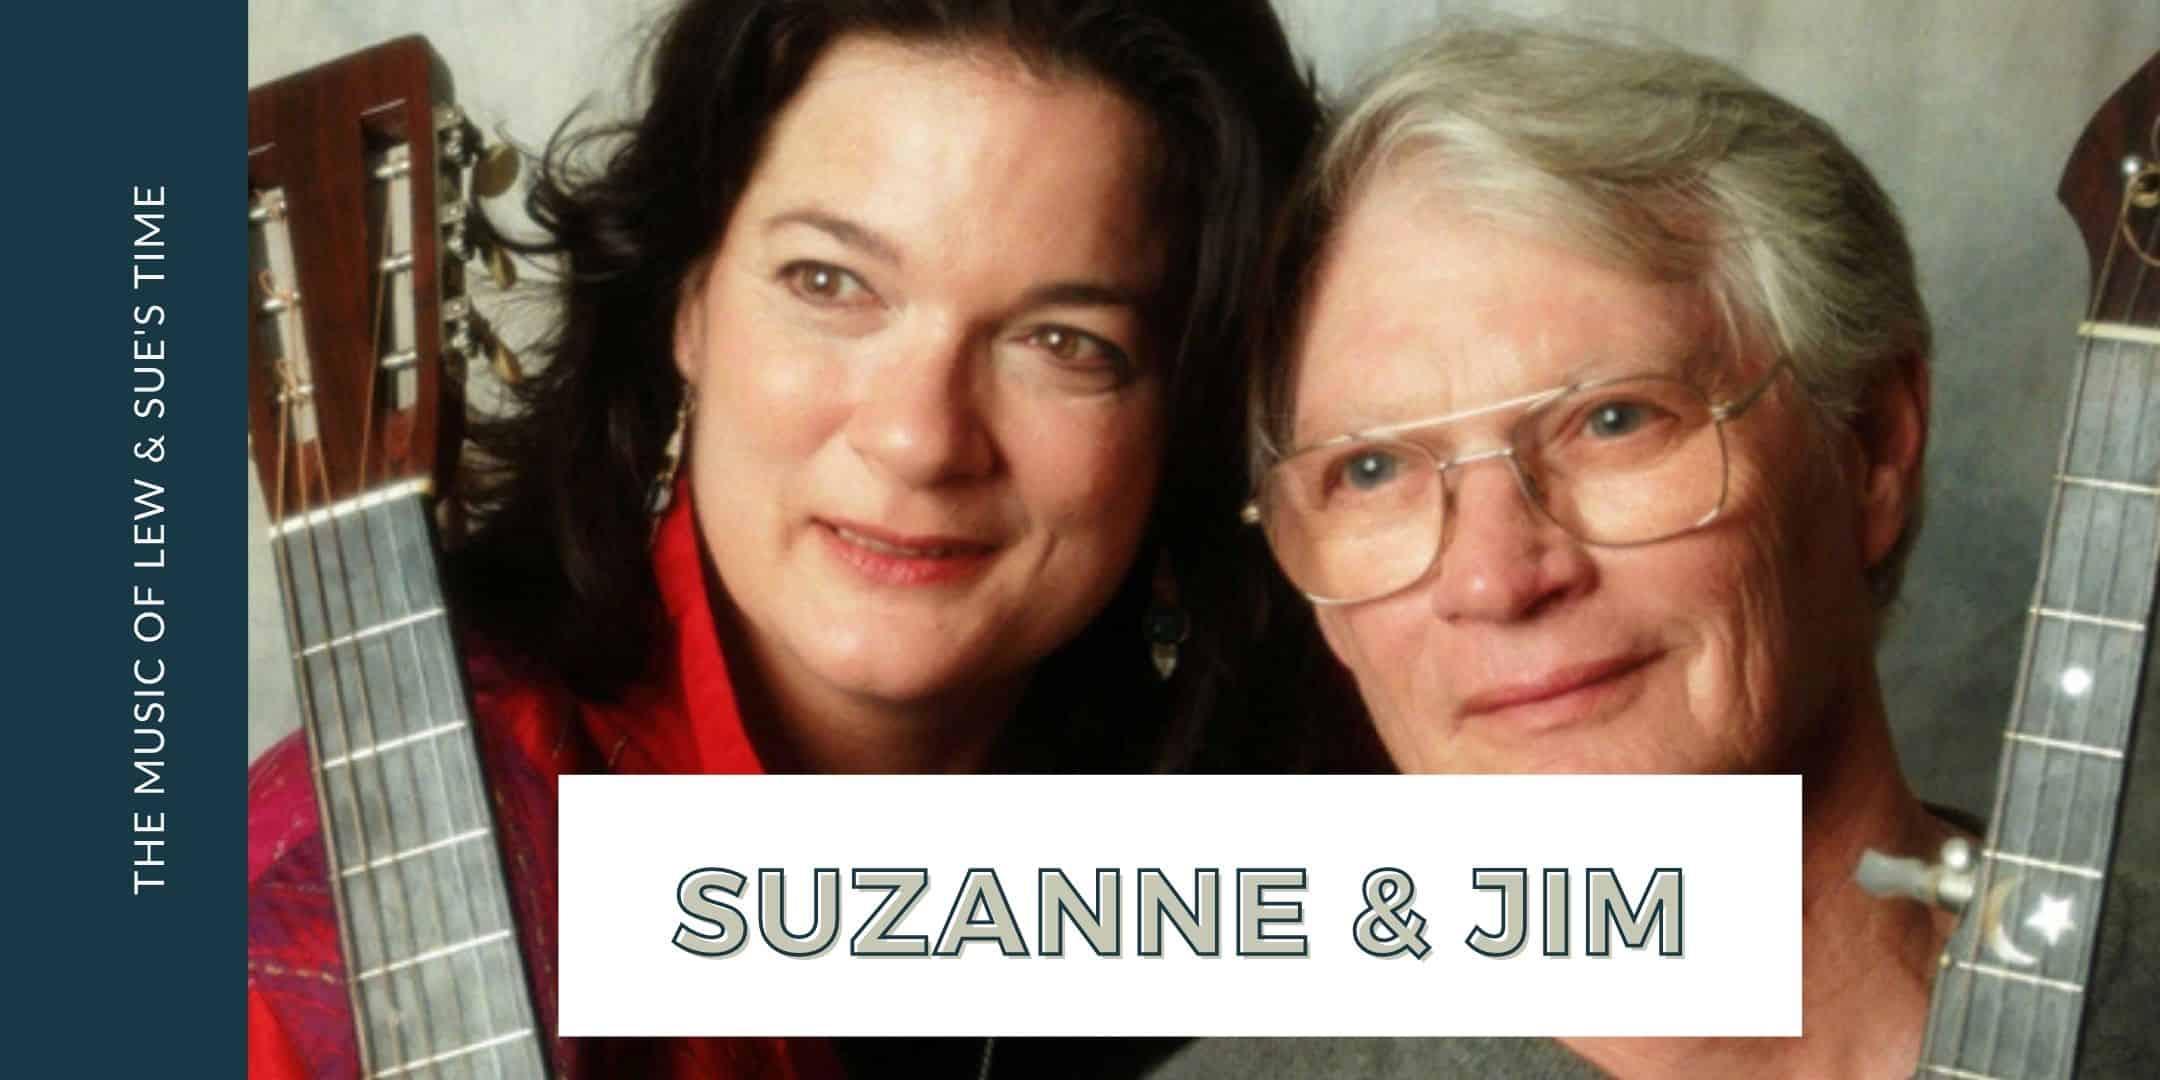 Suzanne and Jim Civil War music